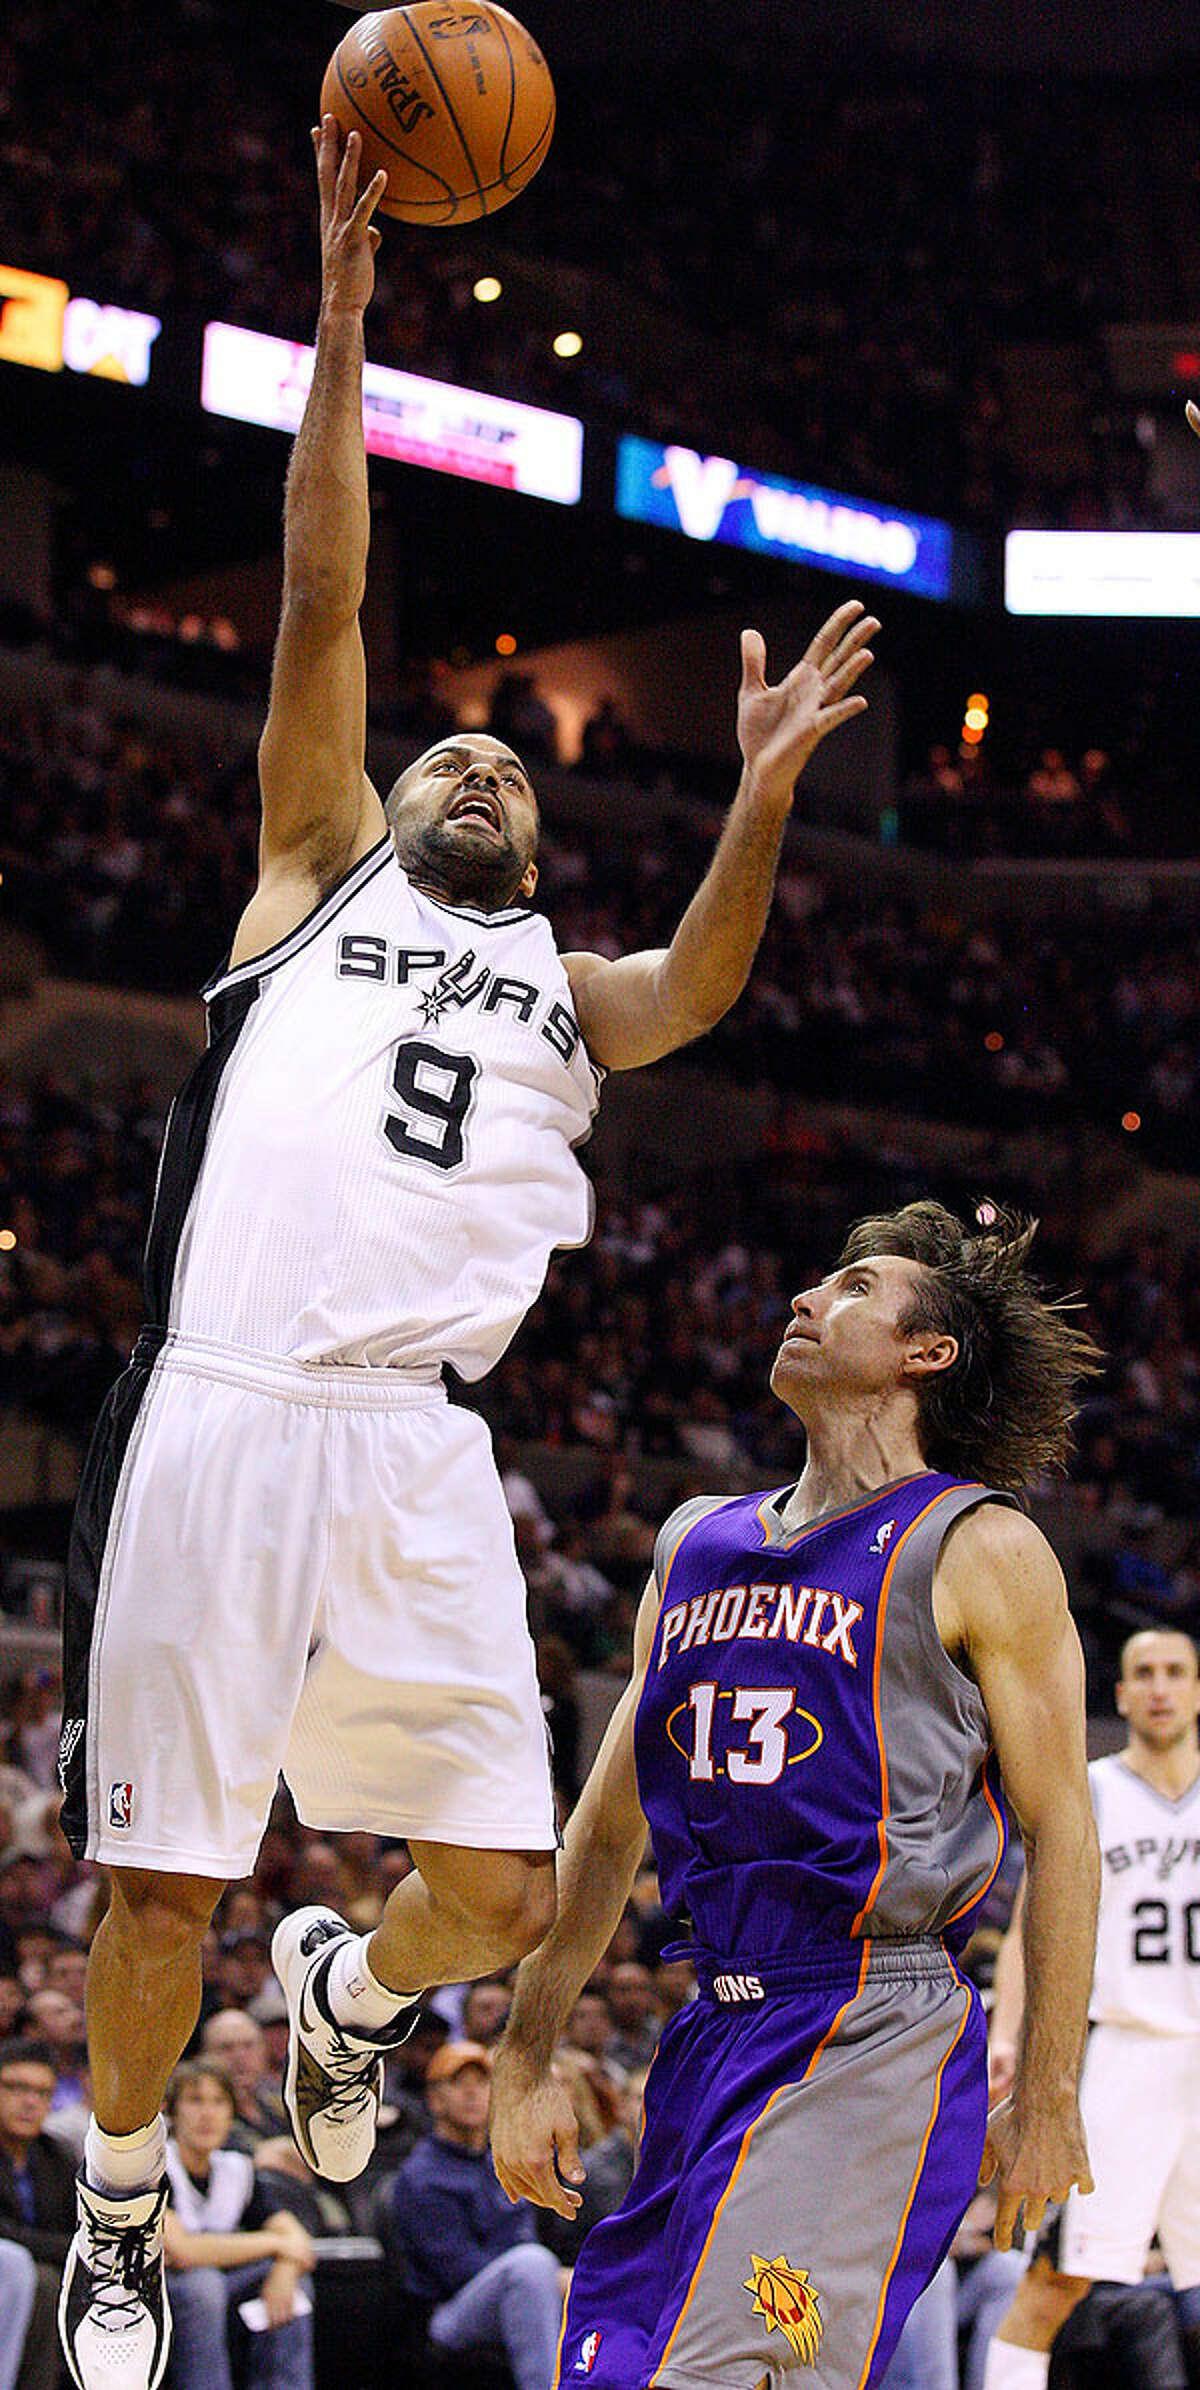 Spurs' Tony Parker shoots around Suns' Steve Nash during second half action Monday Dec. 20, 2010 at the AT&T Center. Spurs won 118-110.